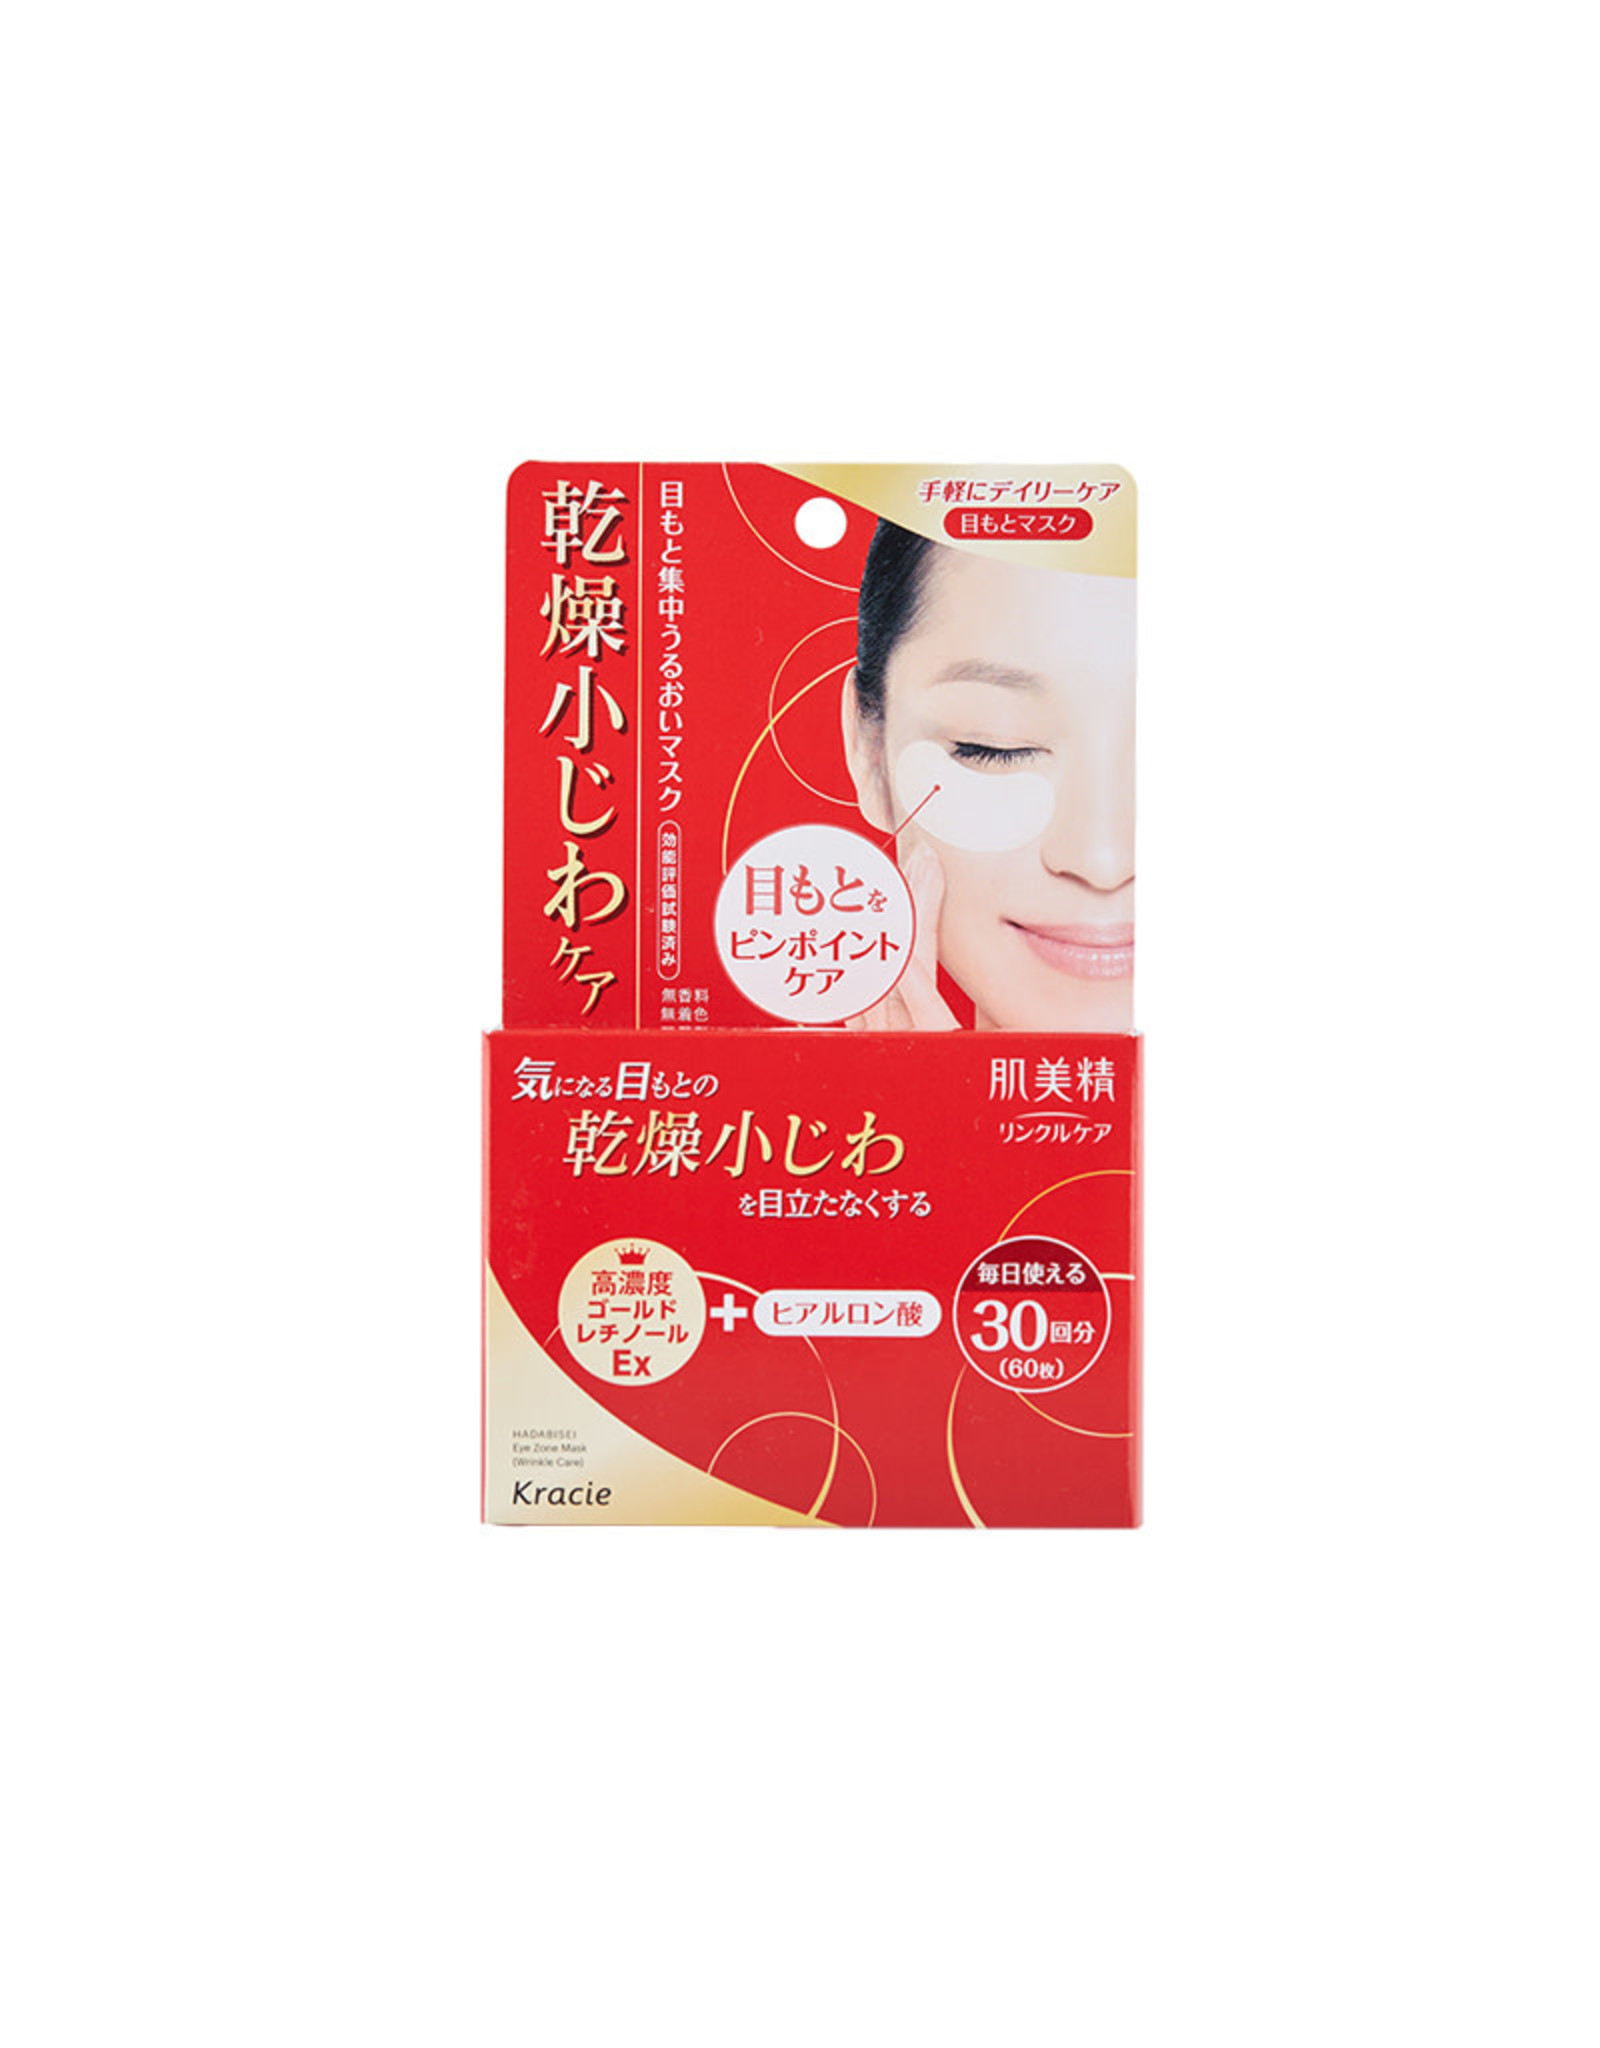 Hadabisei Hadabisei Eye Zone Intensive Wrinkle Care Pack